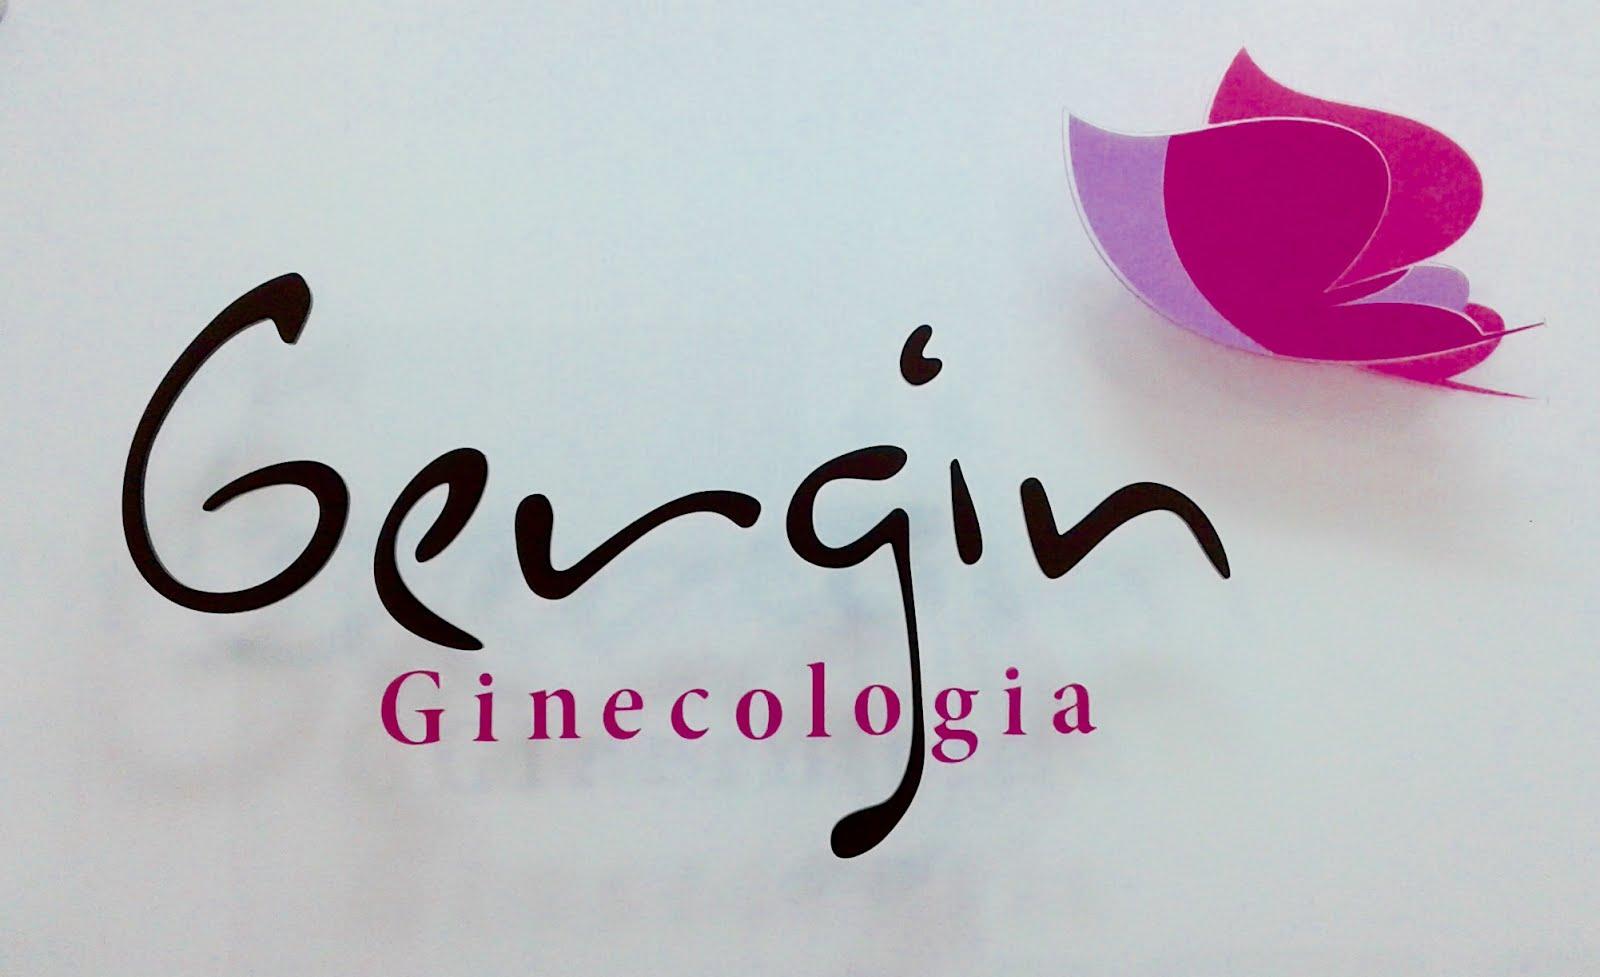 Gergin Ginecologia